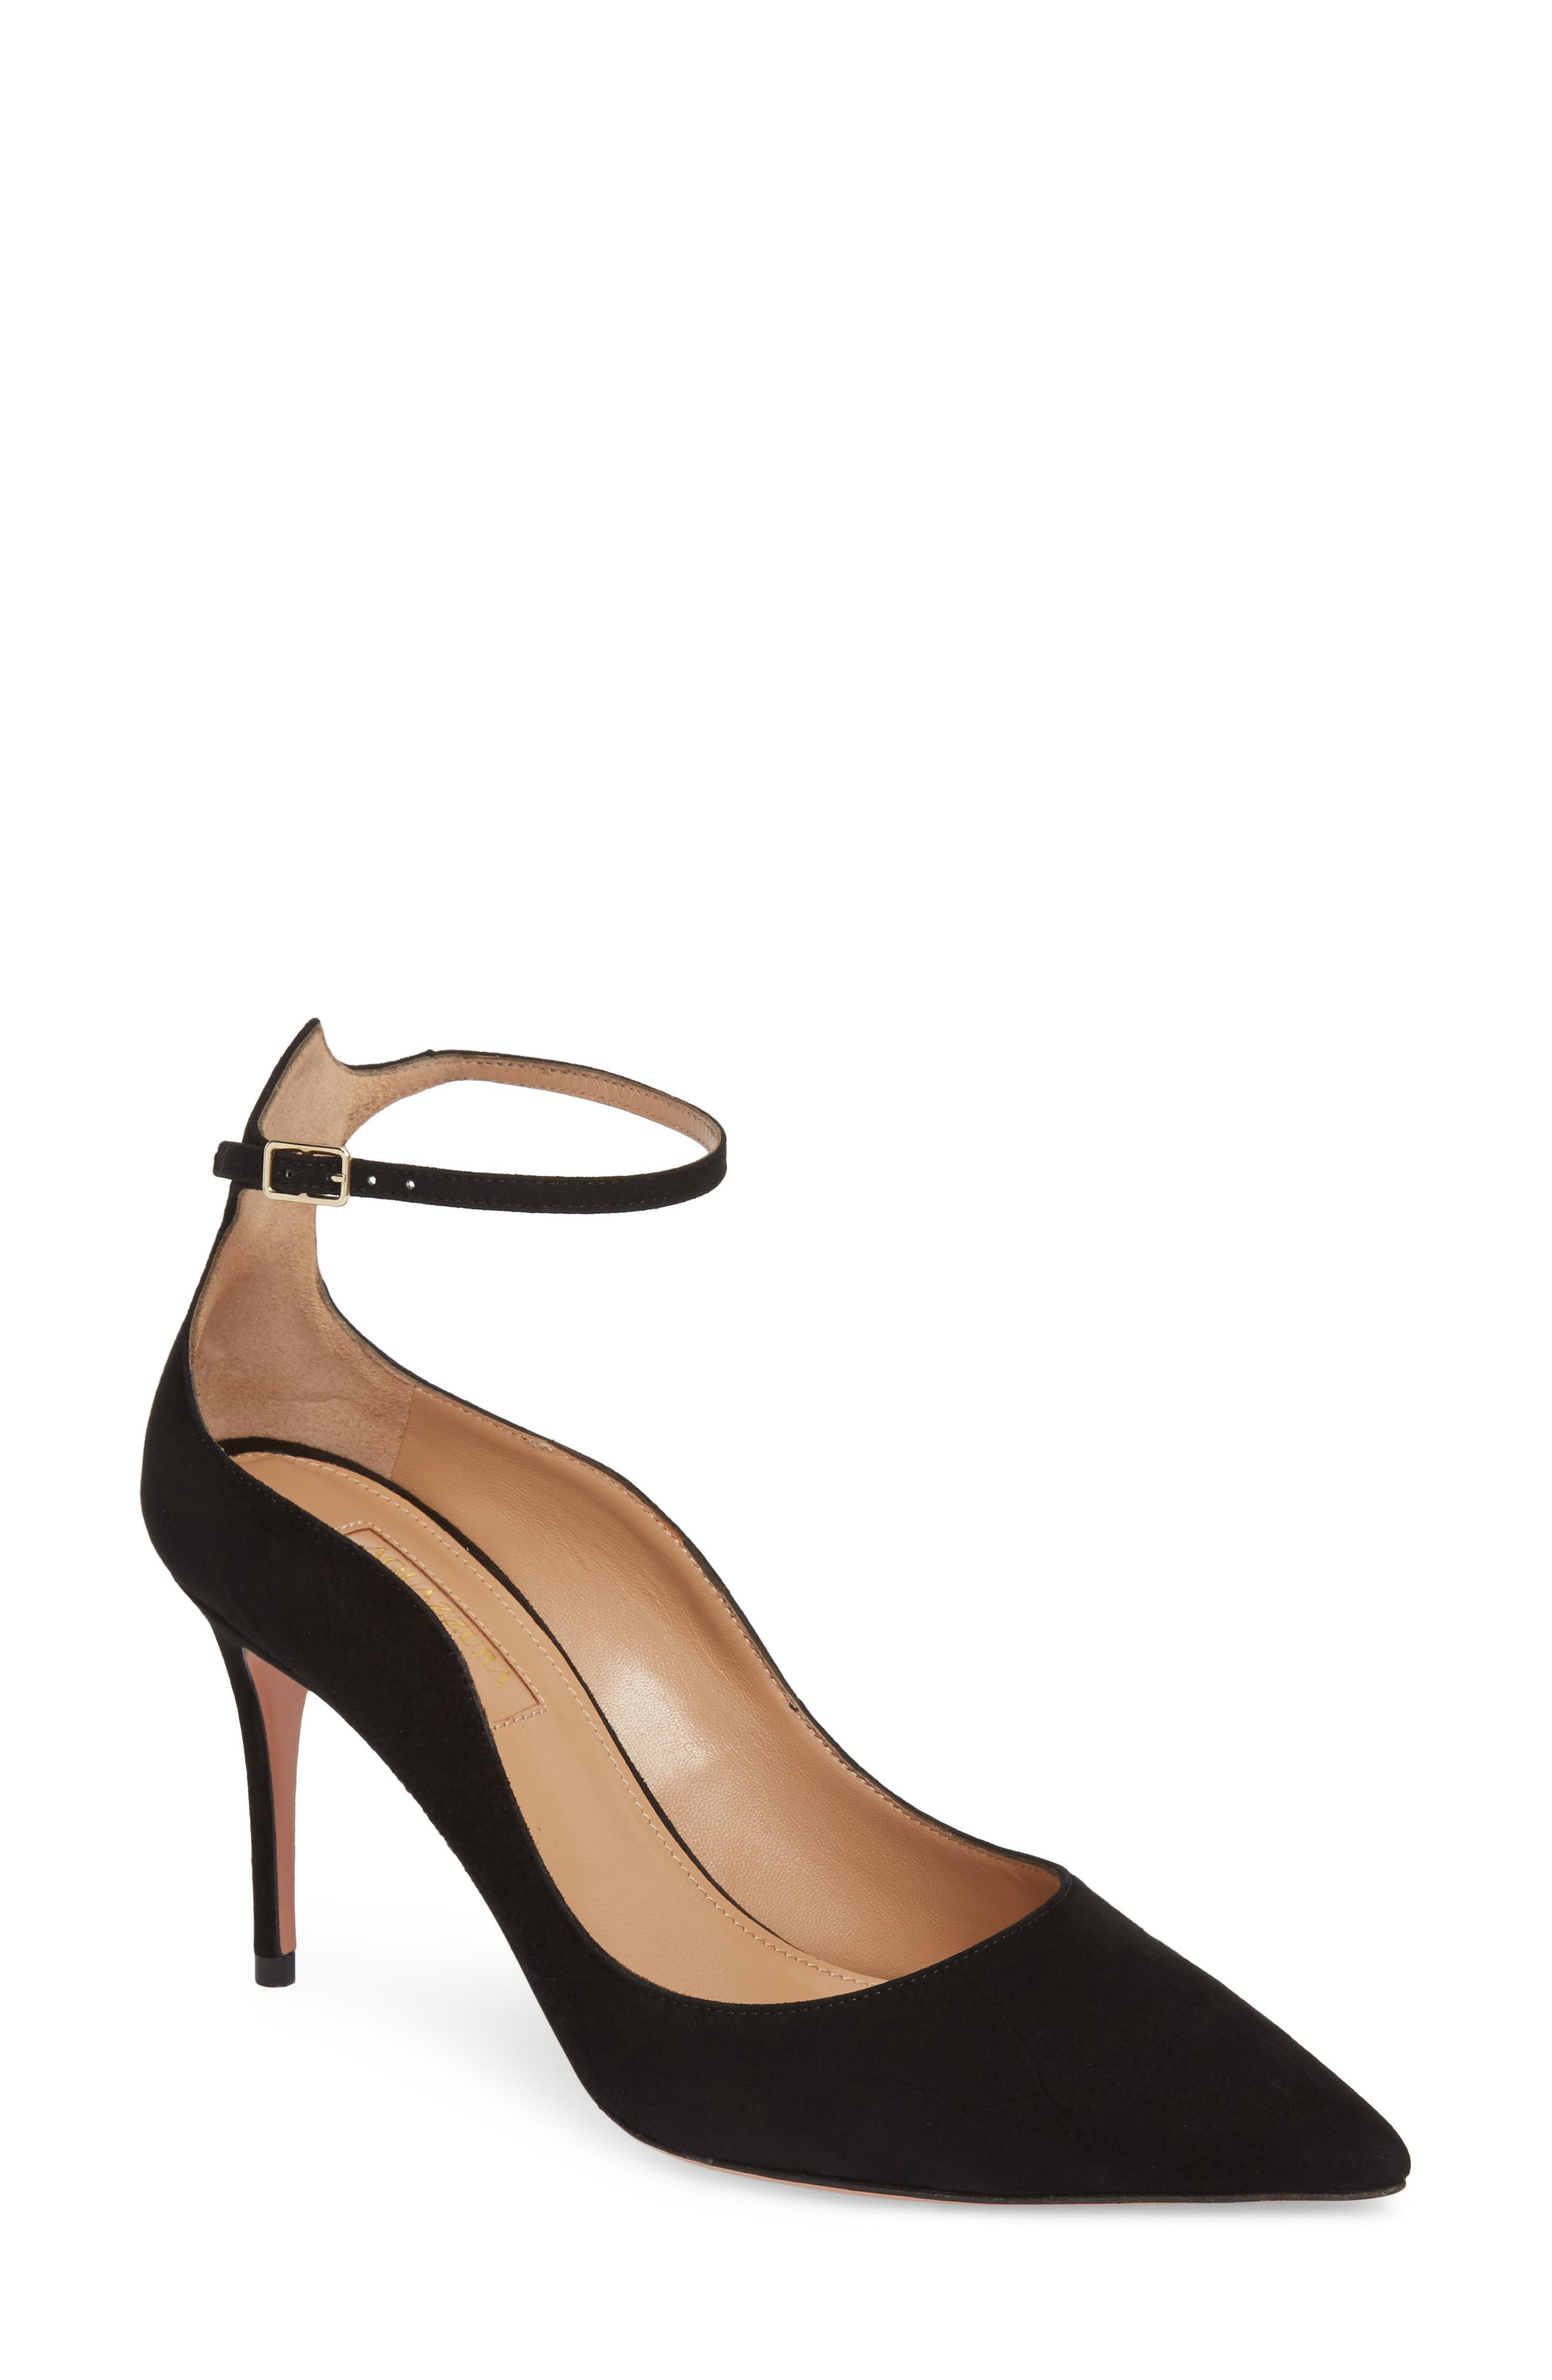 Dolce Vita Ankle Strap Pump,                         Main,                         color, Black